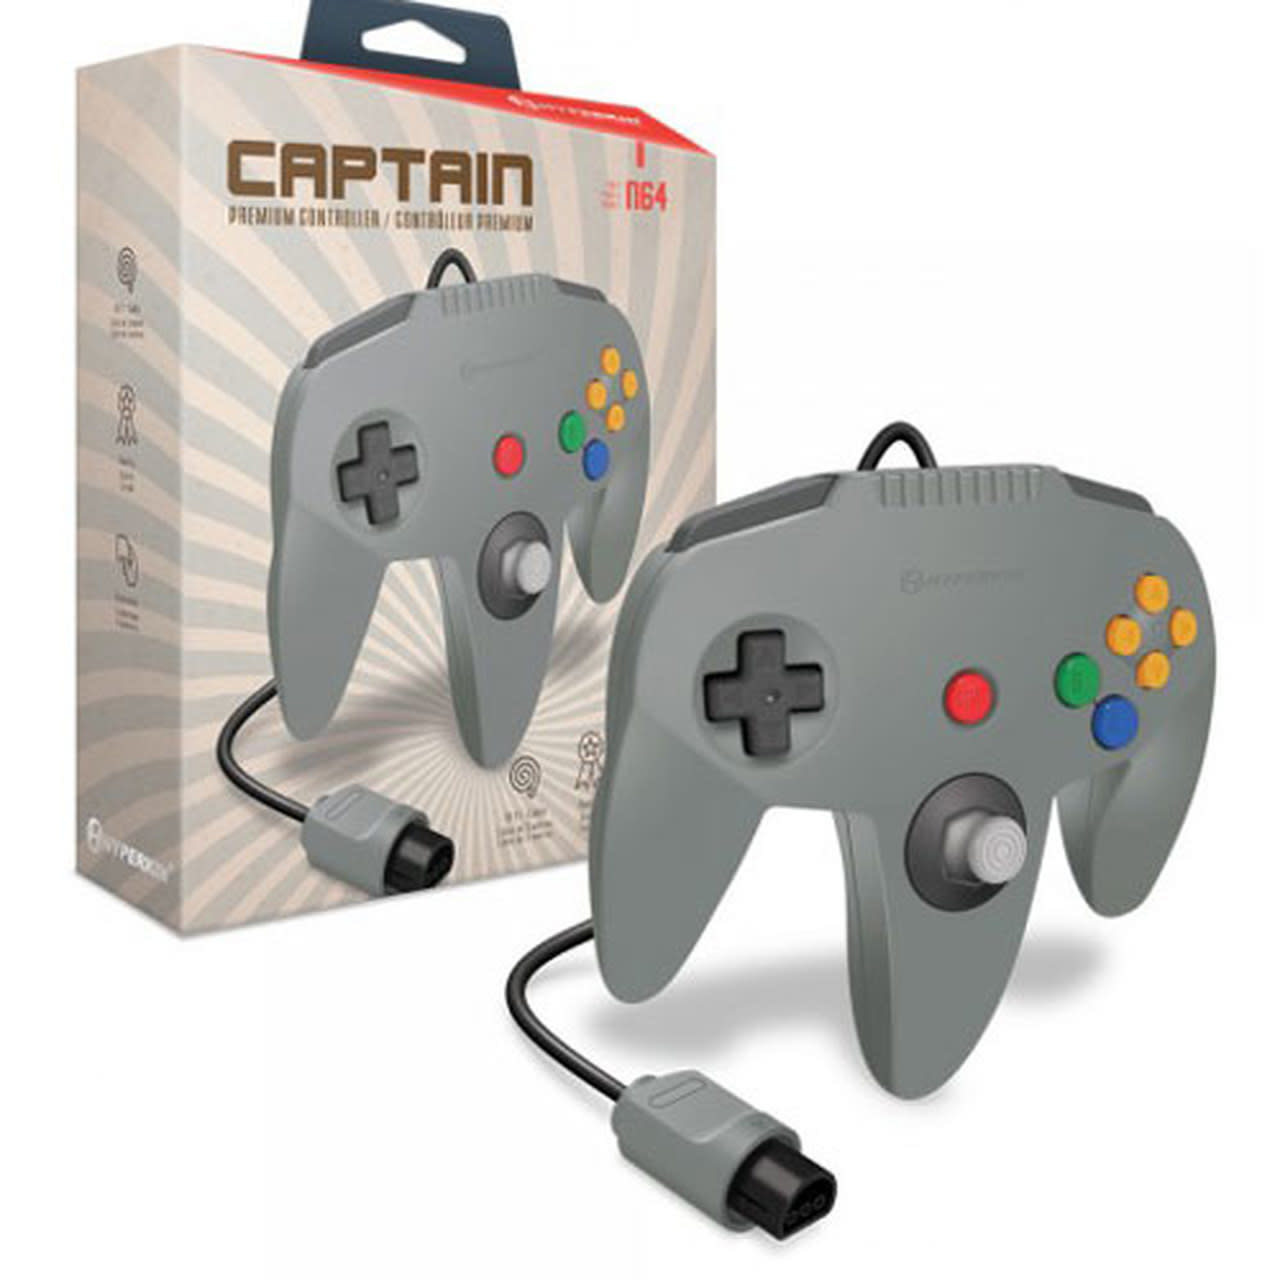 """Captain"" Premium Controller for N64 (Gray) - Hyperkin"